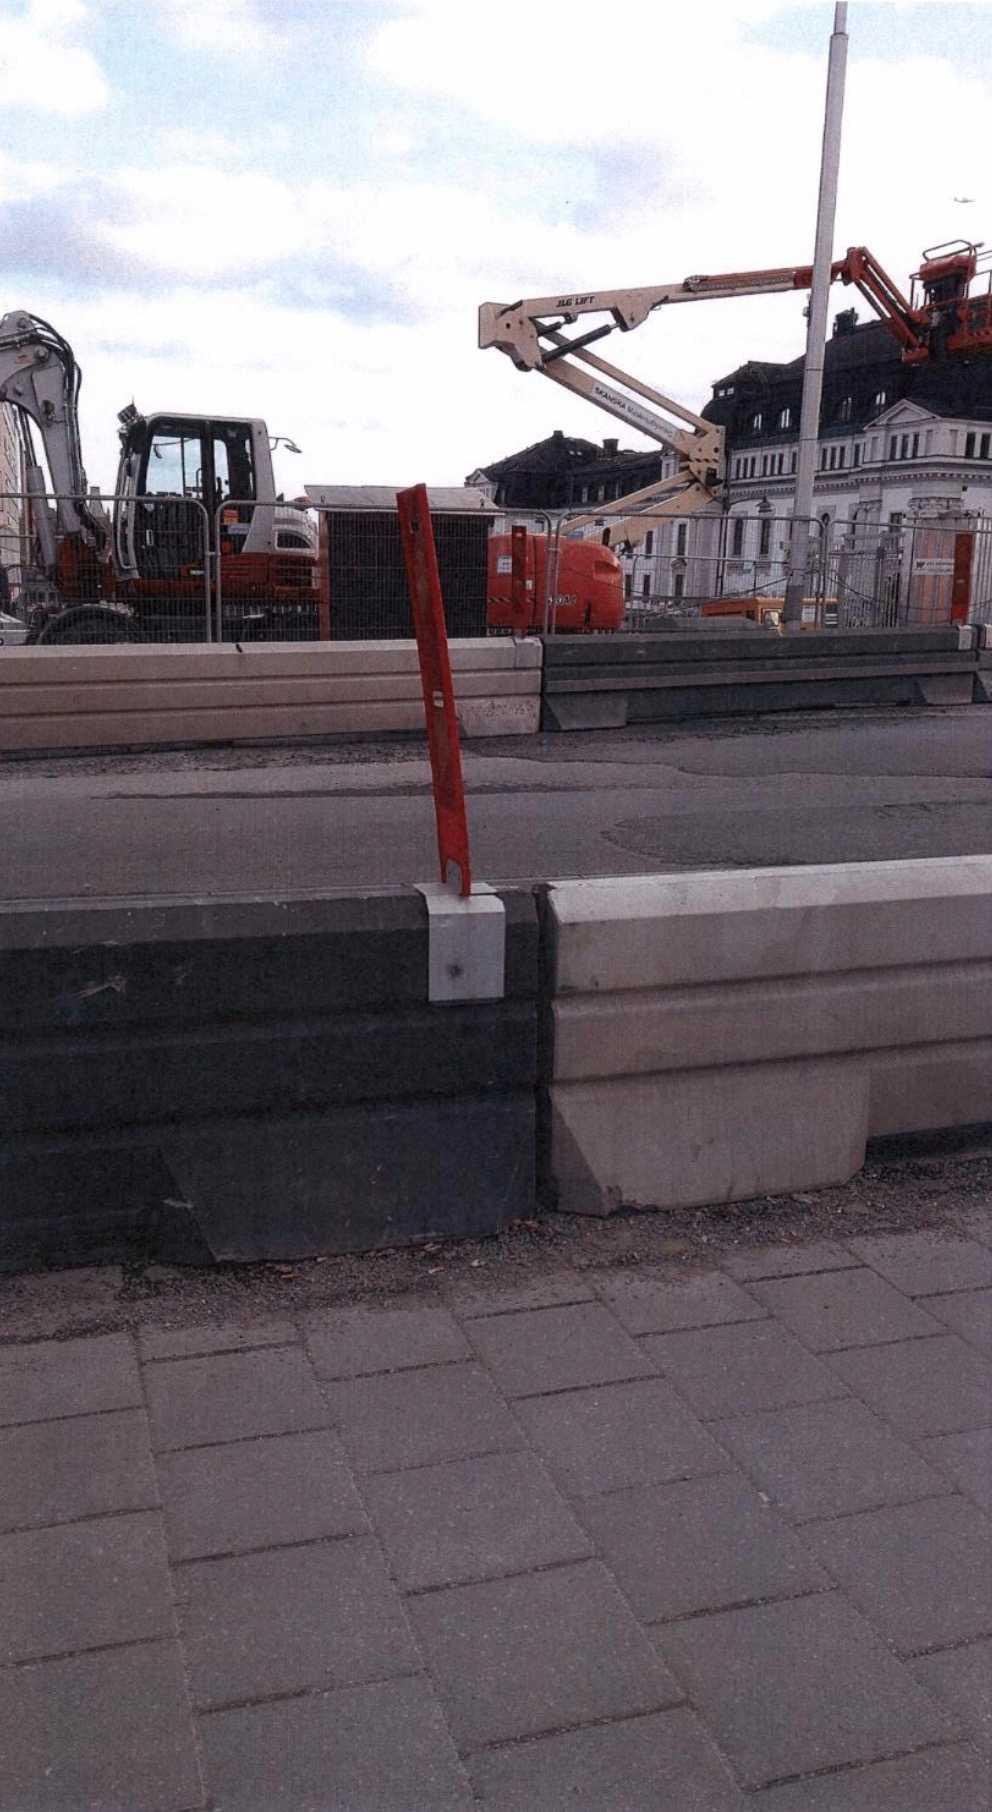 Akilovs bilder från centrala Stockholm.